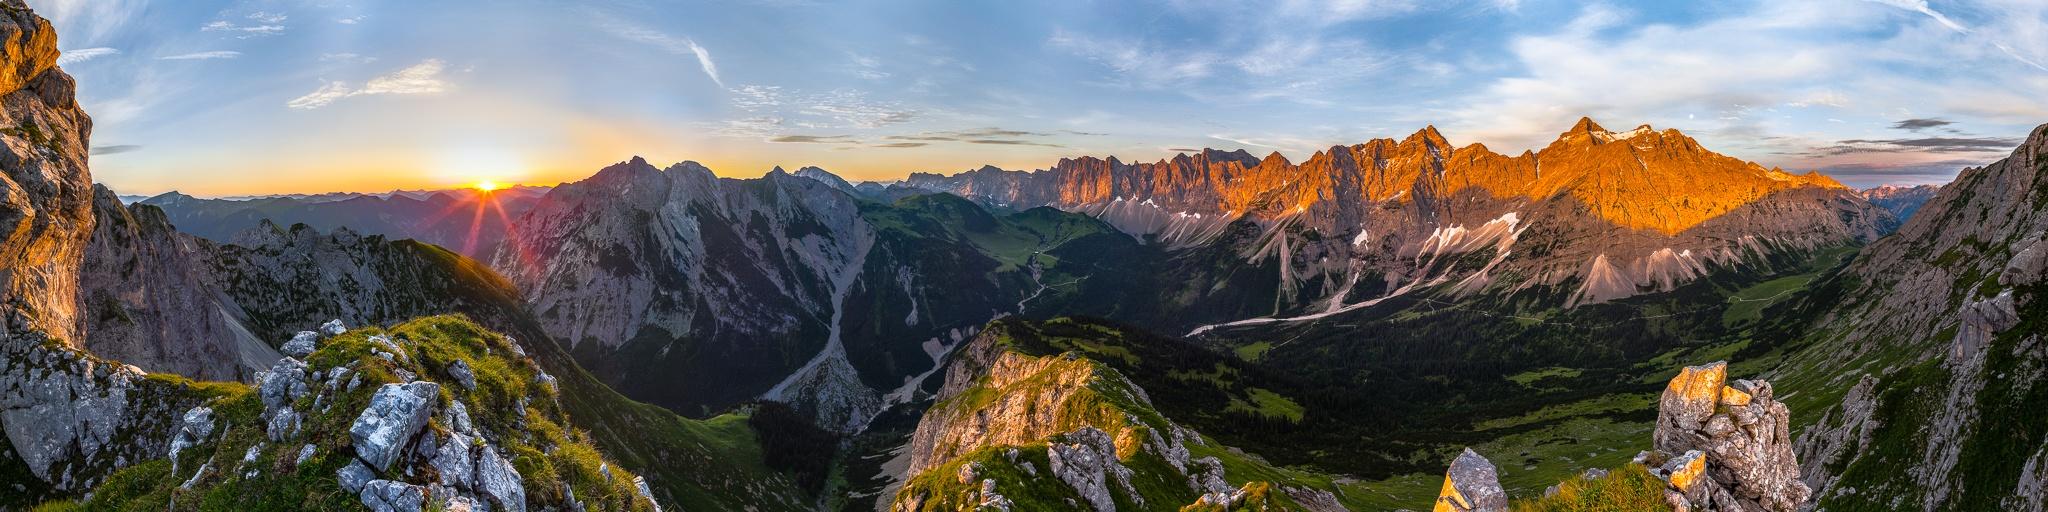 Karwendelhauptkamm Laliderer Wand Sonnenaufgang Alpen